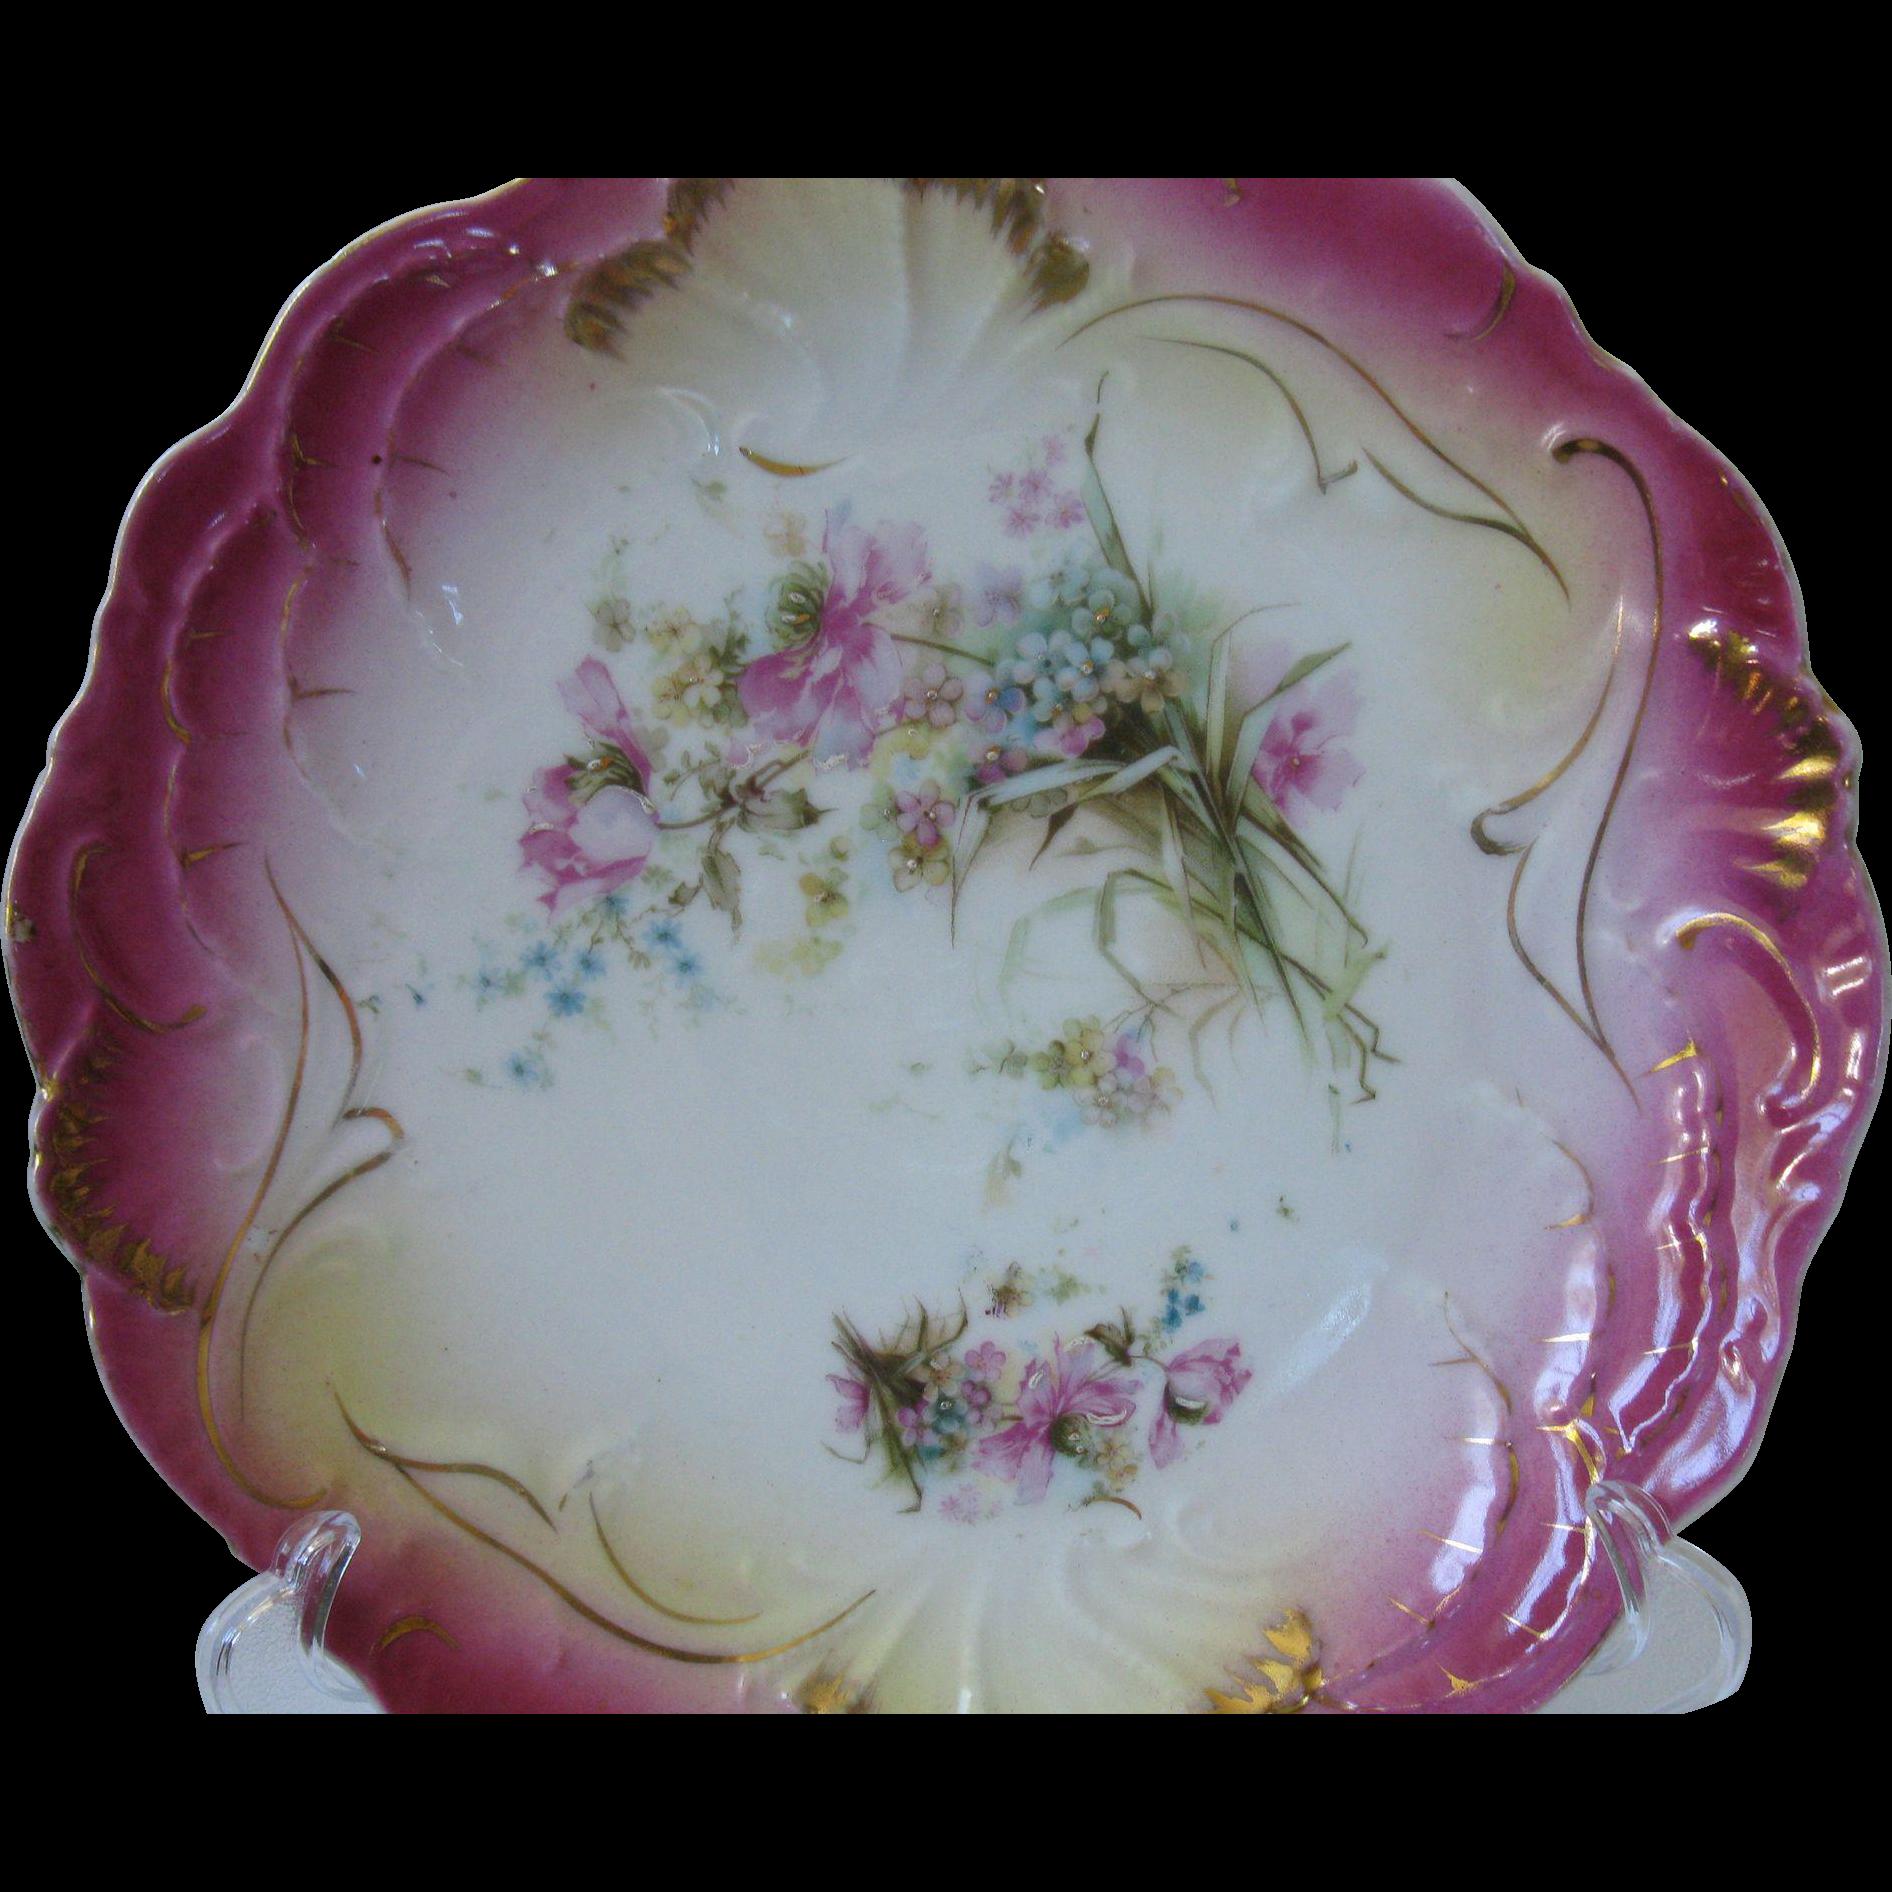 Very Rare, Antique Hand-Painted Porcelain Bavarian Cake